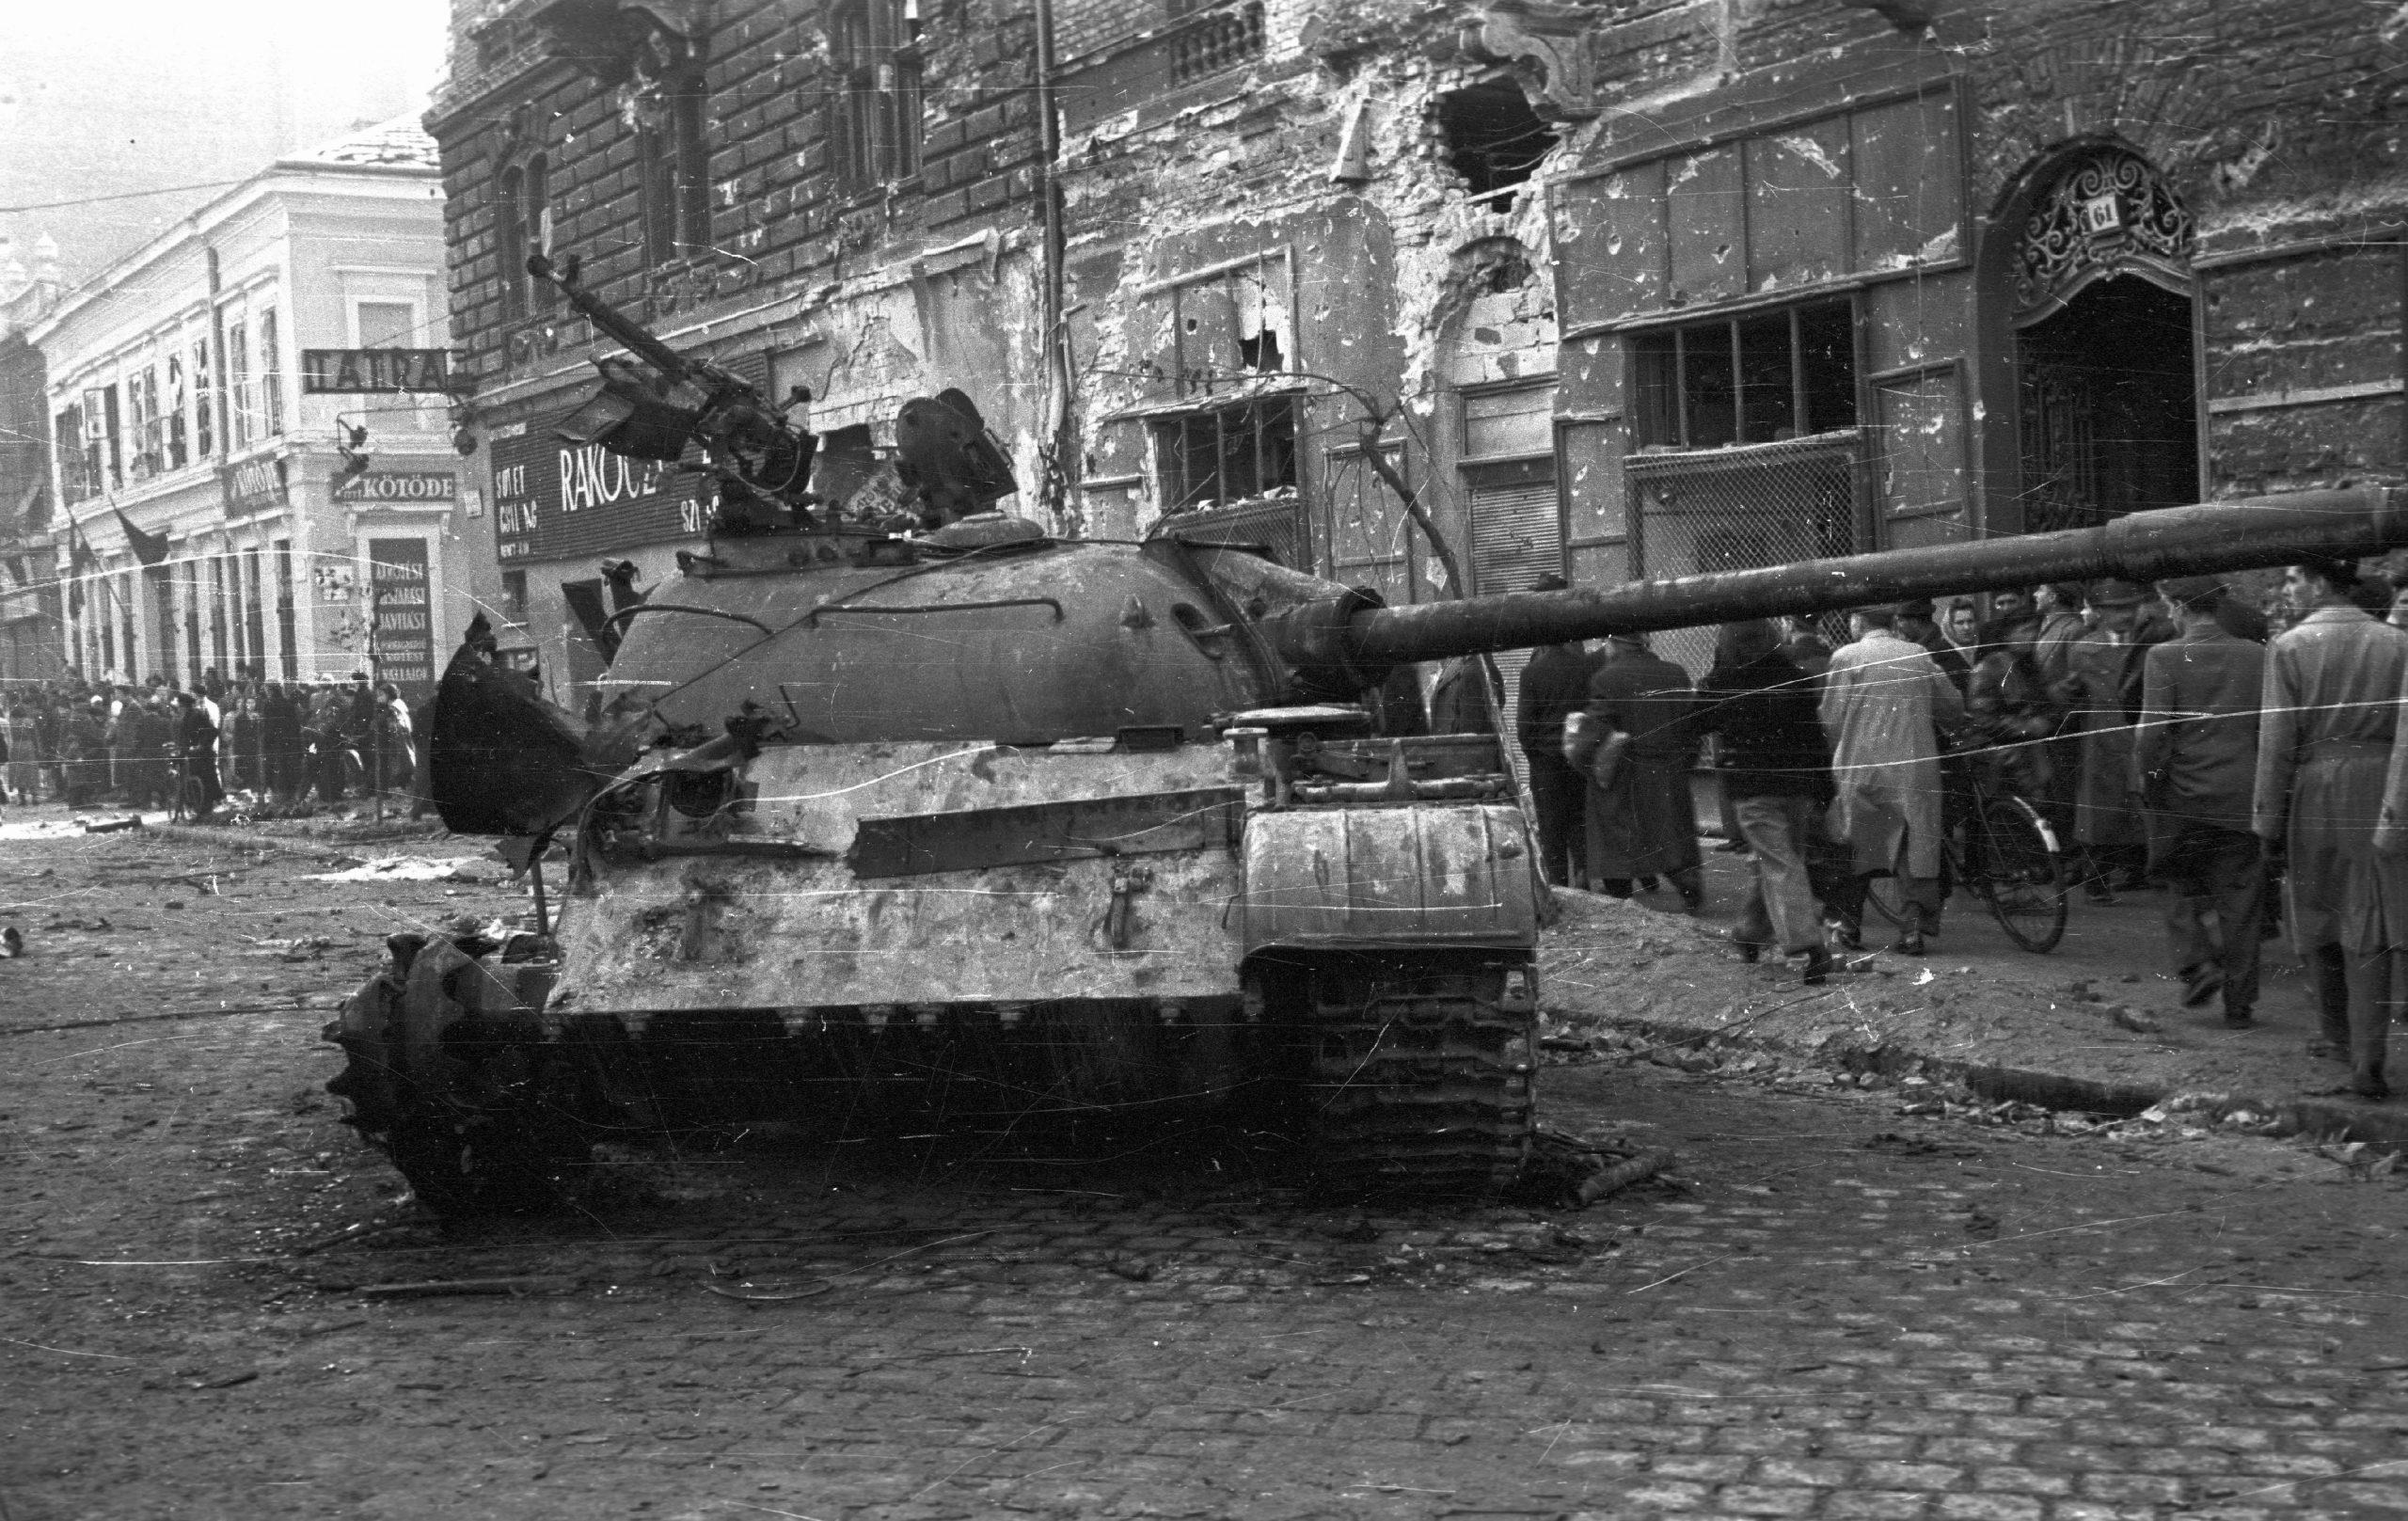 1956. Szovjet tank Budapesten. / Fotó: Fortepan.hu, ad.: Nagy Gyula